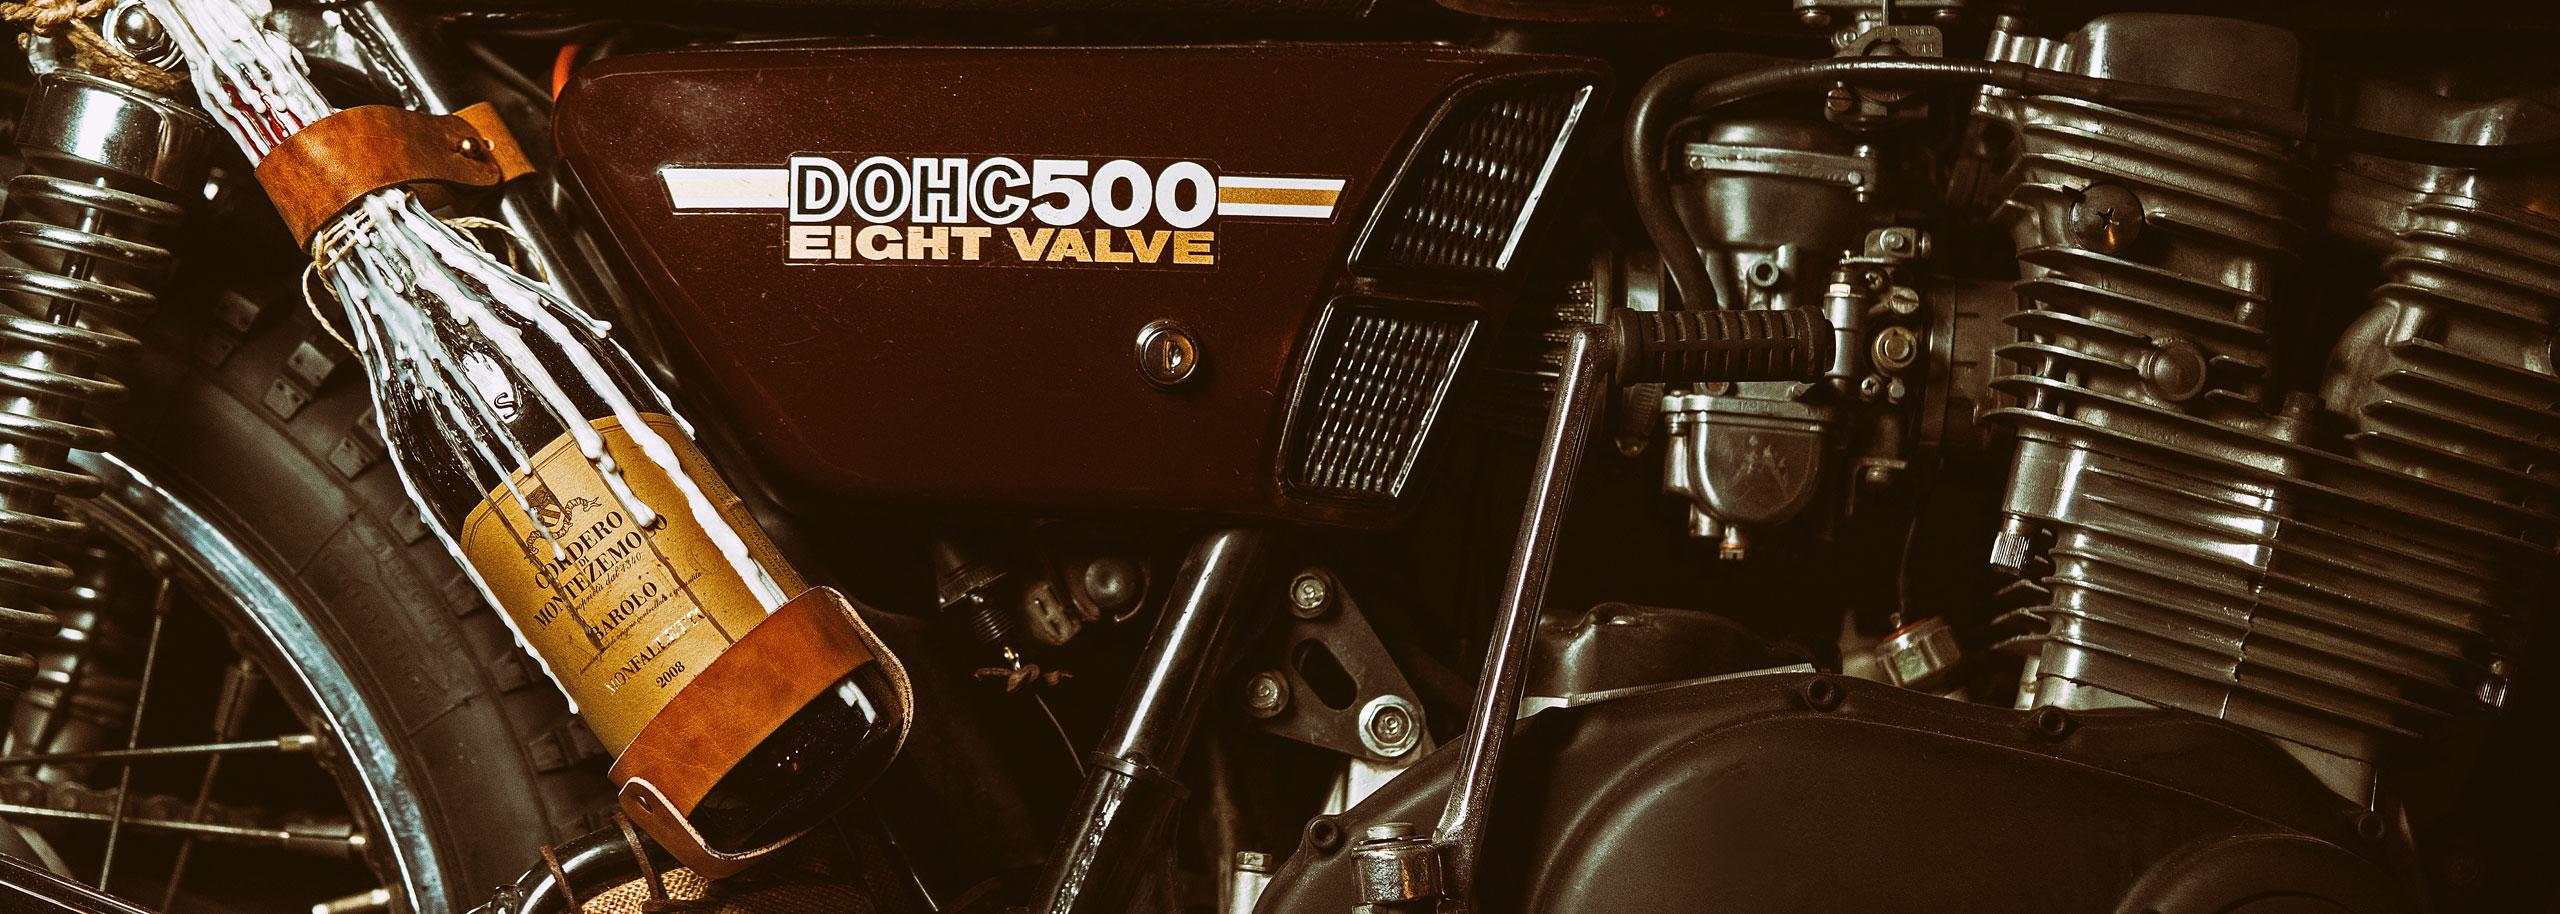 03_TITAN-VOODOO_Yamaha-XS-500_Cafe-Racer-Graz-Motorrad-Umbau-Steiermark-Oesterreich-Vintage_Custom-Bikes_Zweirad_Custom-Wien-Graz